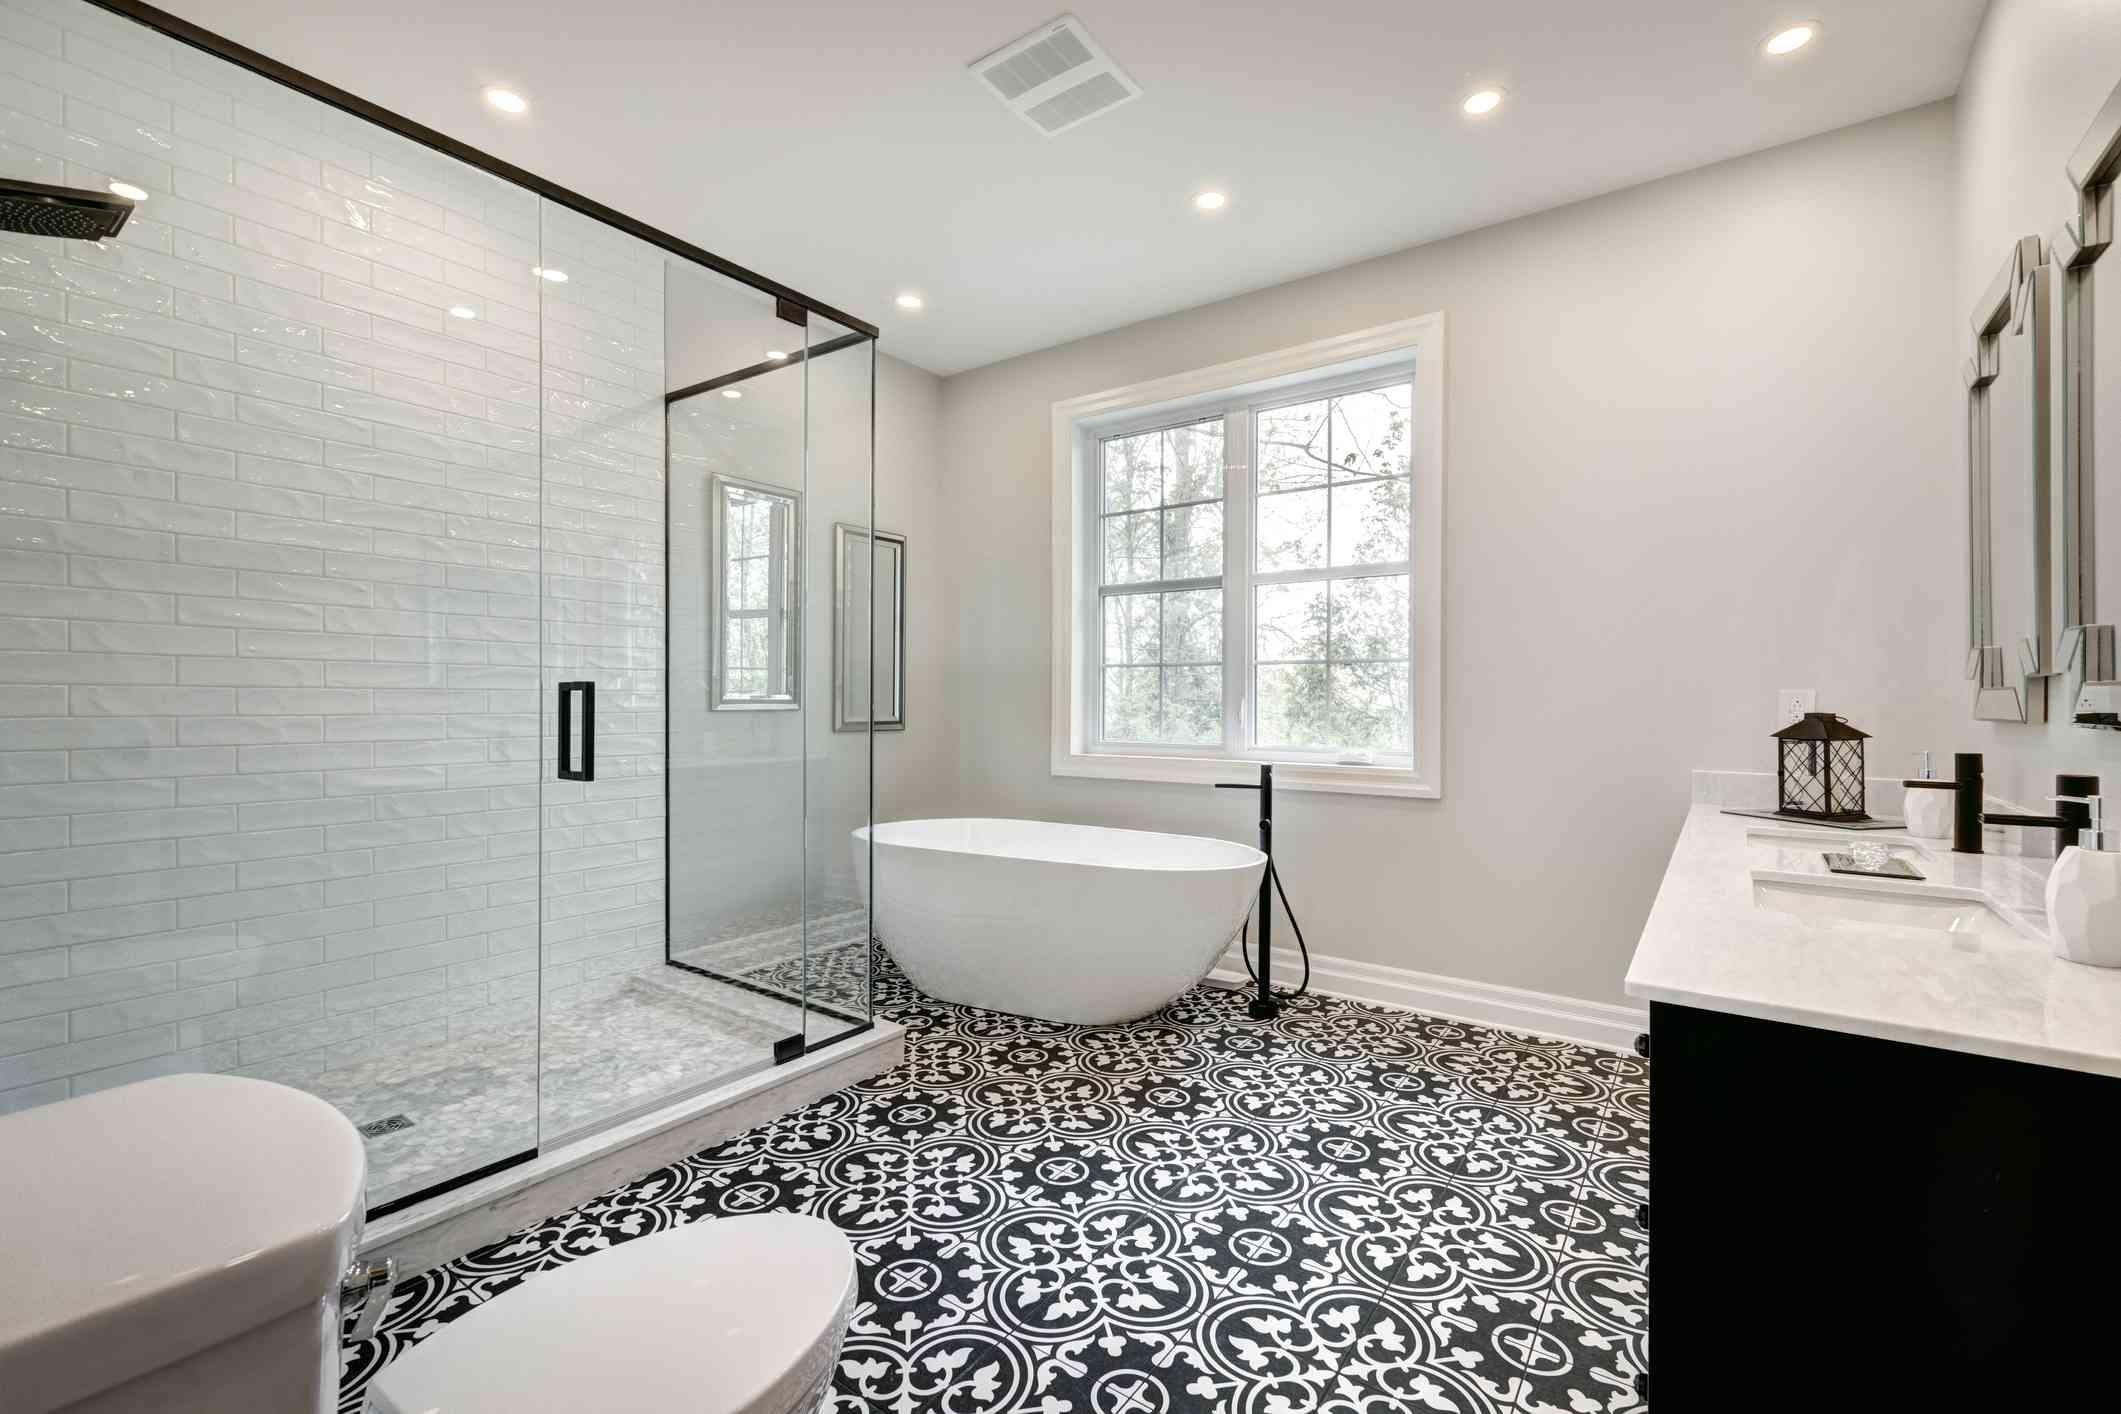 15 Cheap Bathroom Remodel Ideas